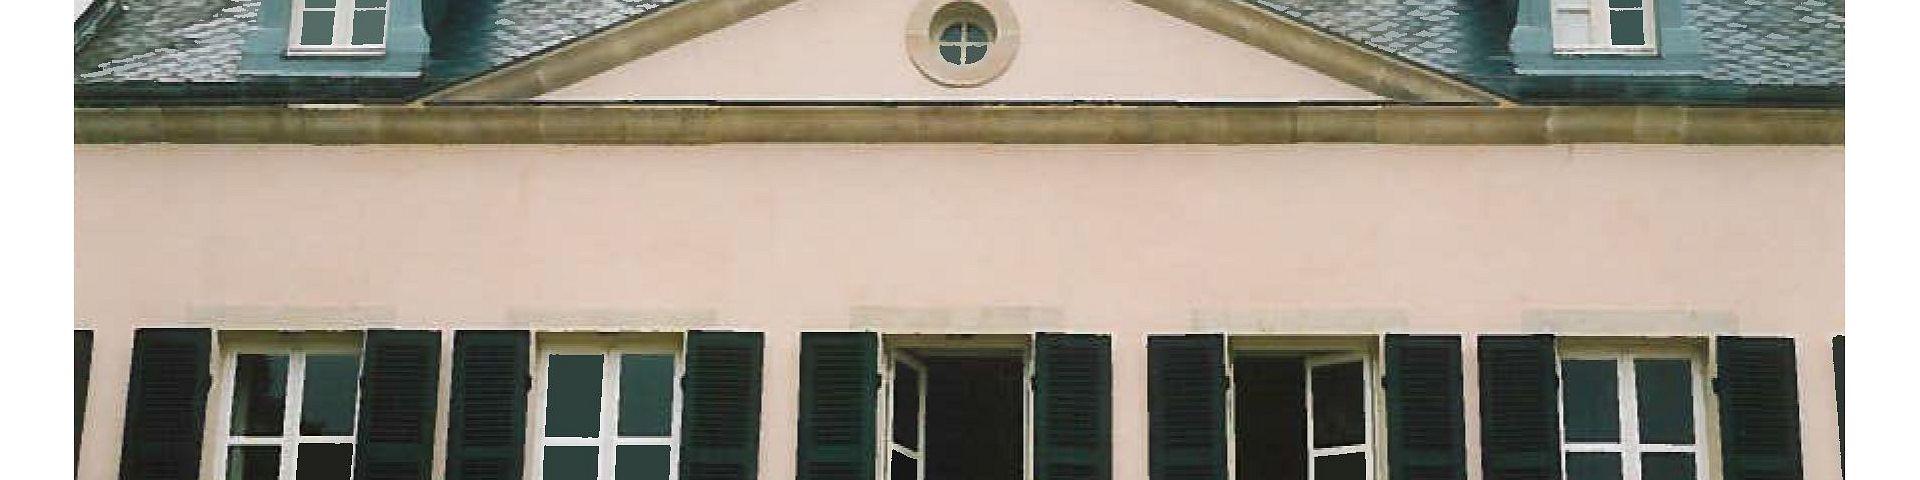 Saint-Sauveur - Maison bourgeoise XVIIIè (21)